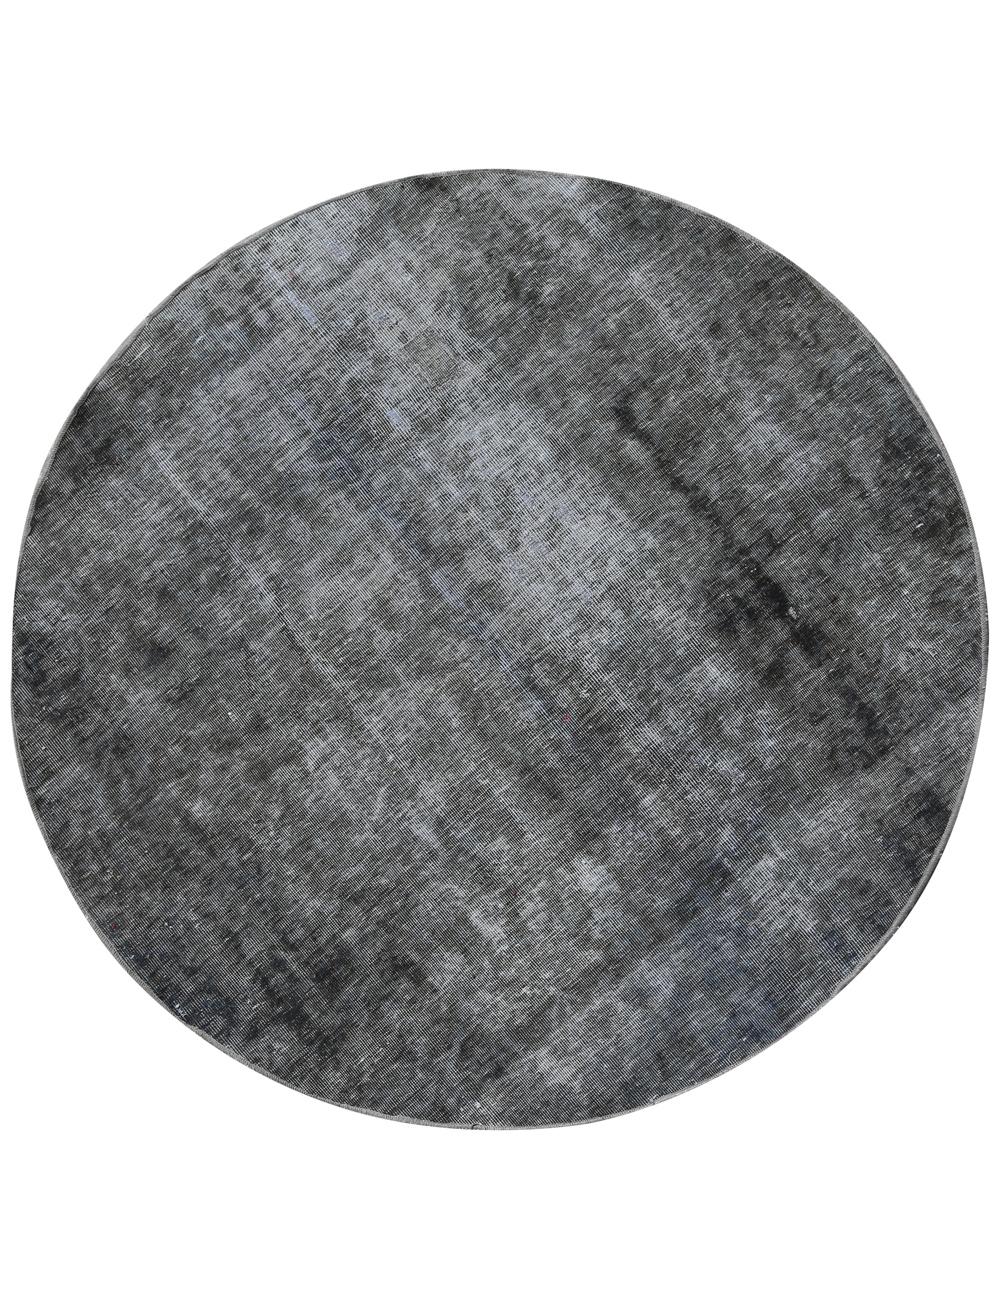 Round Vintage Carpets Rugs Blog